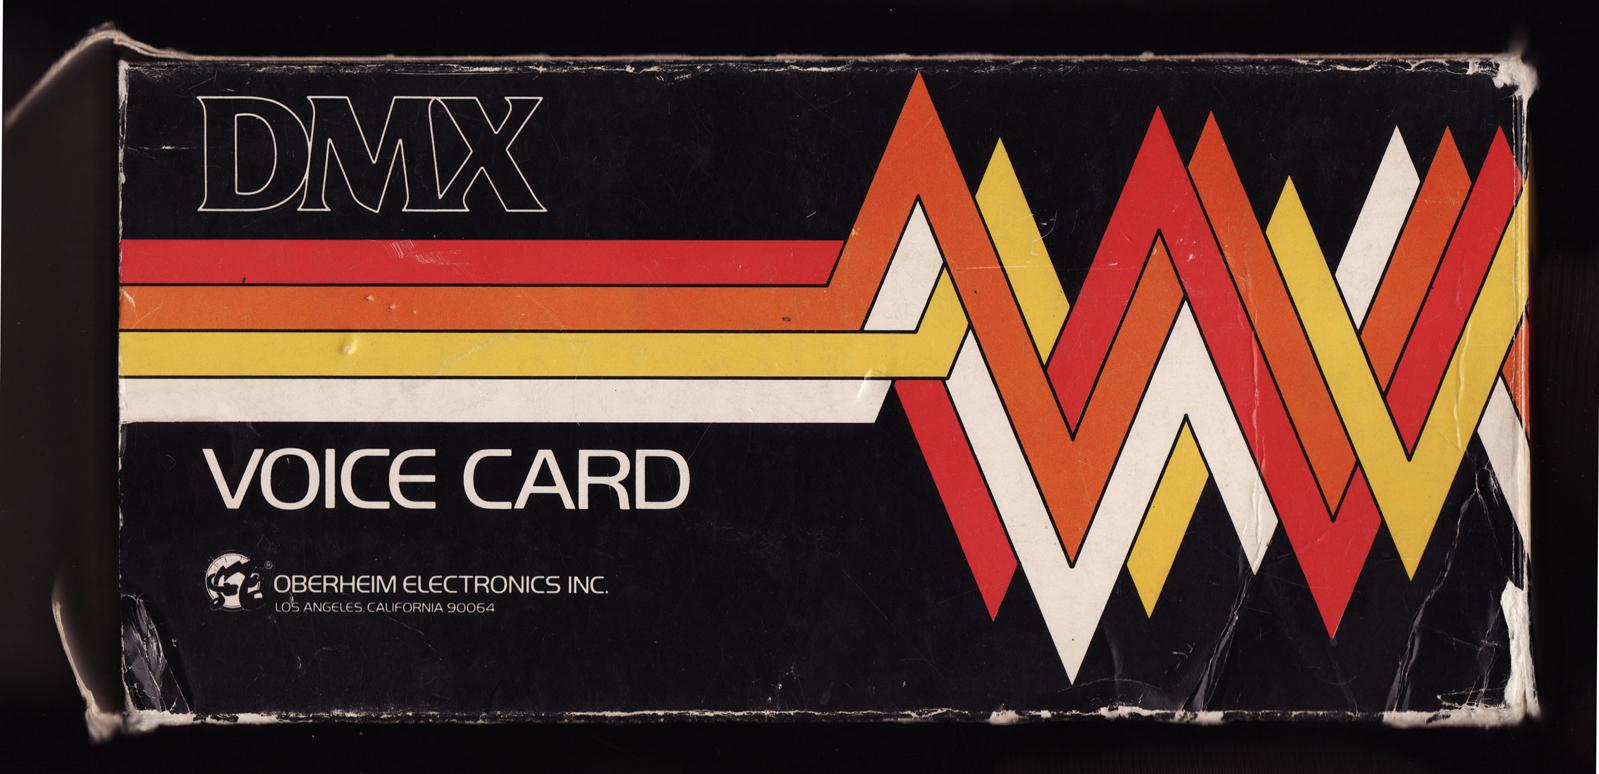 1-dmx-voice-card-box4.jpg